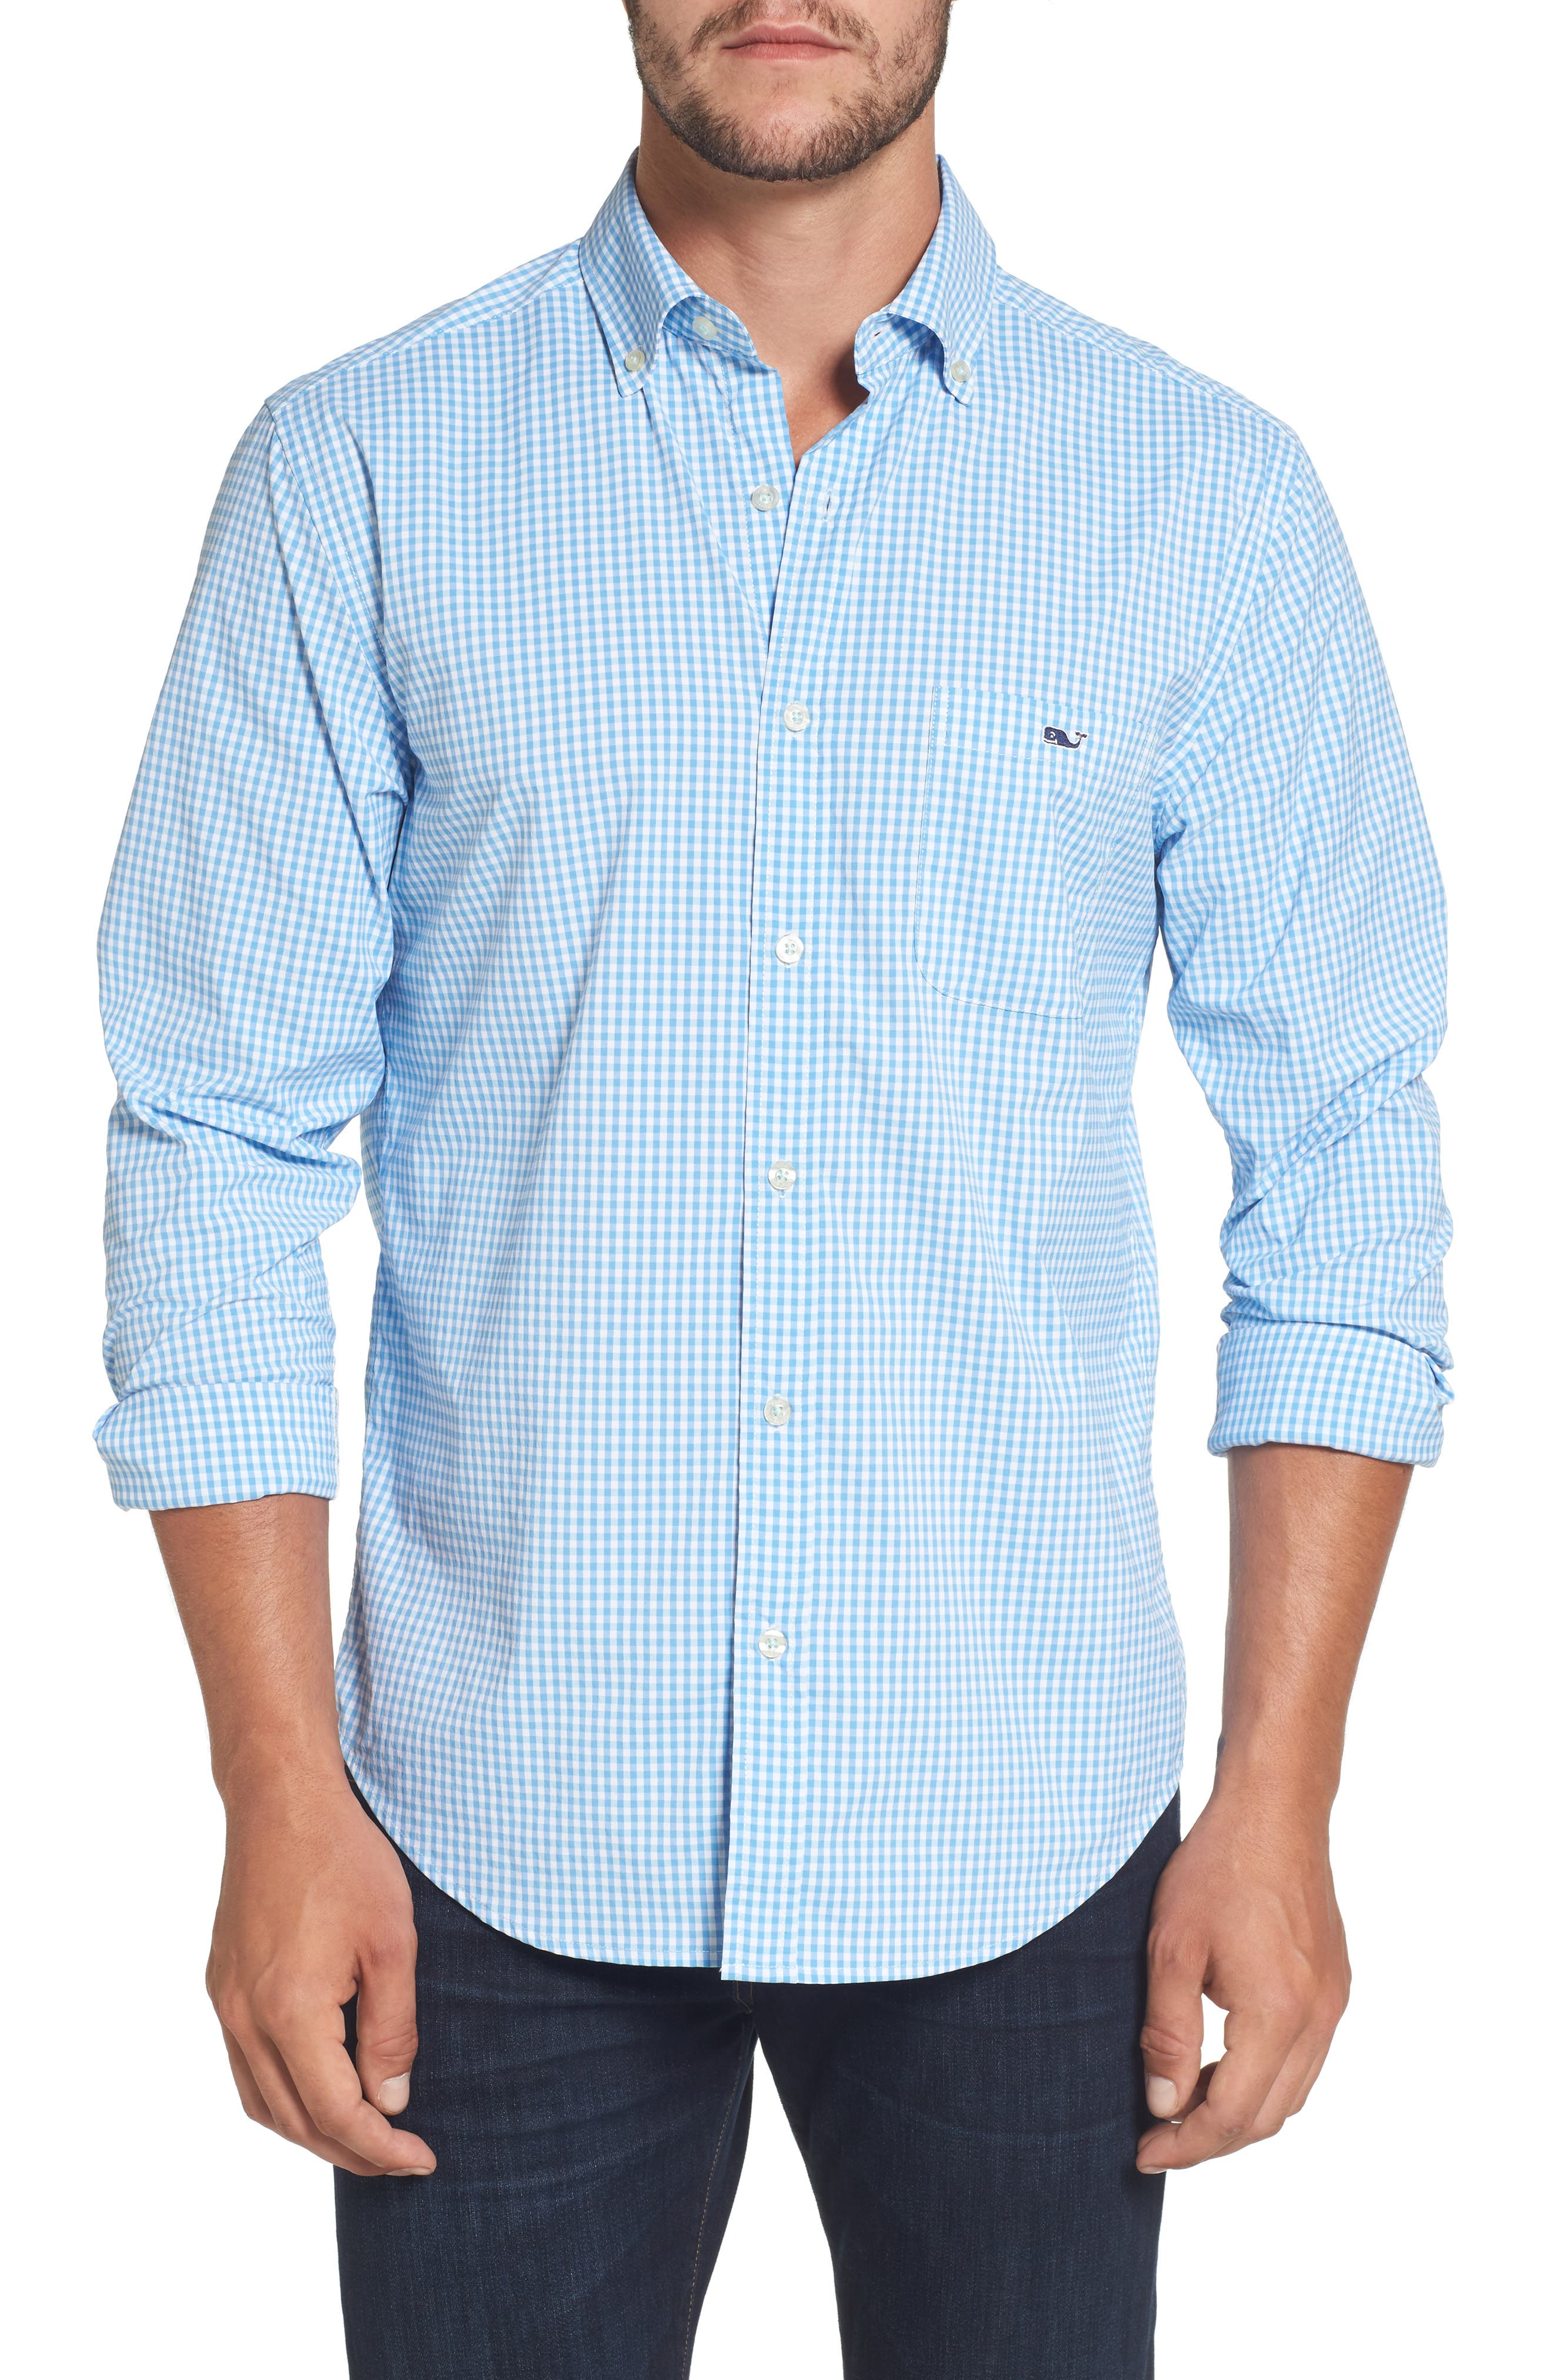 Seawater Gingham Performance Sport Shirt,                         Main,                         color, 496